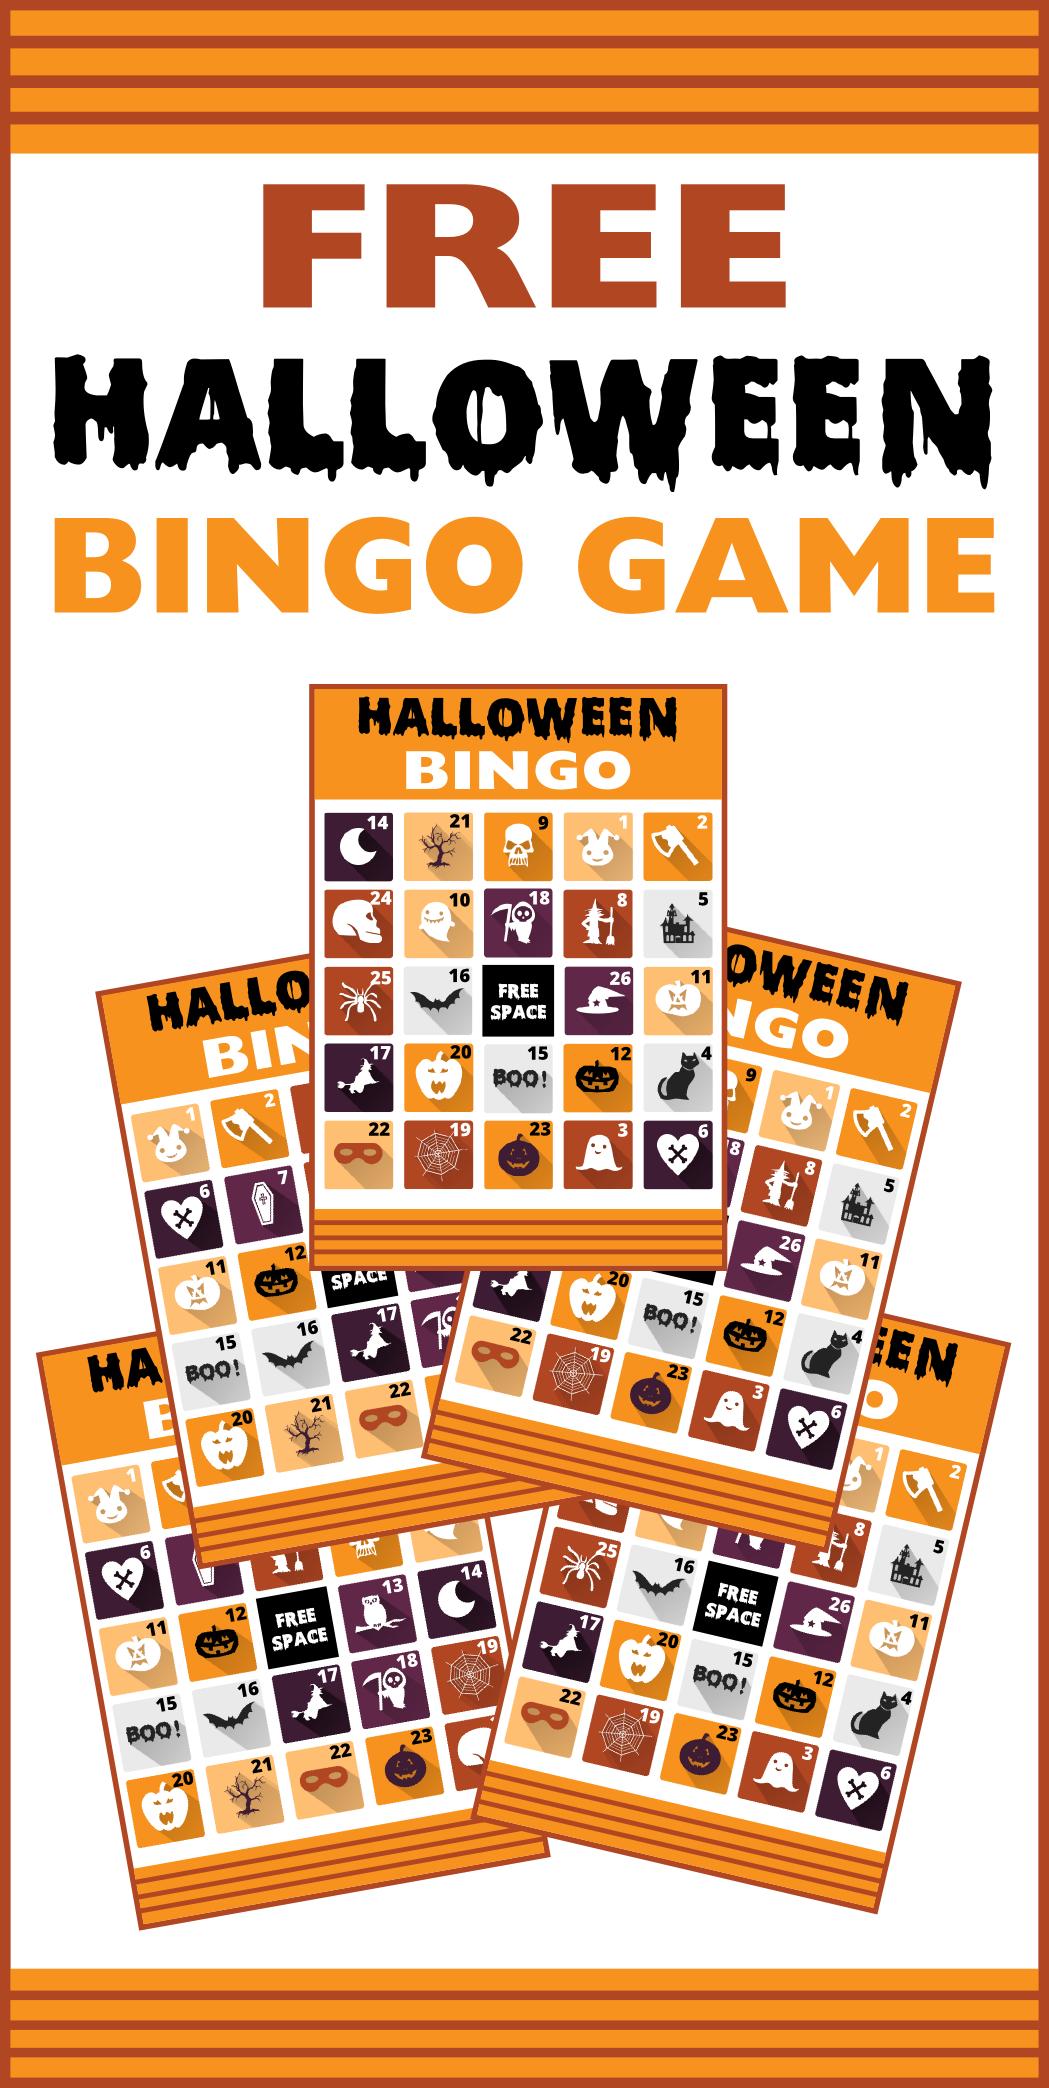 Free Printable Halloween Bingo Cards   Catch My Party - Free Printable Halloween Bingo Cards